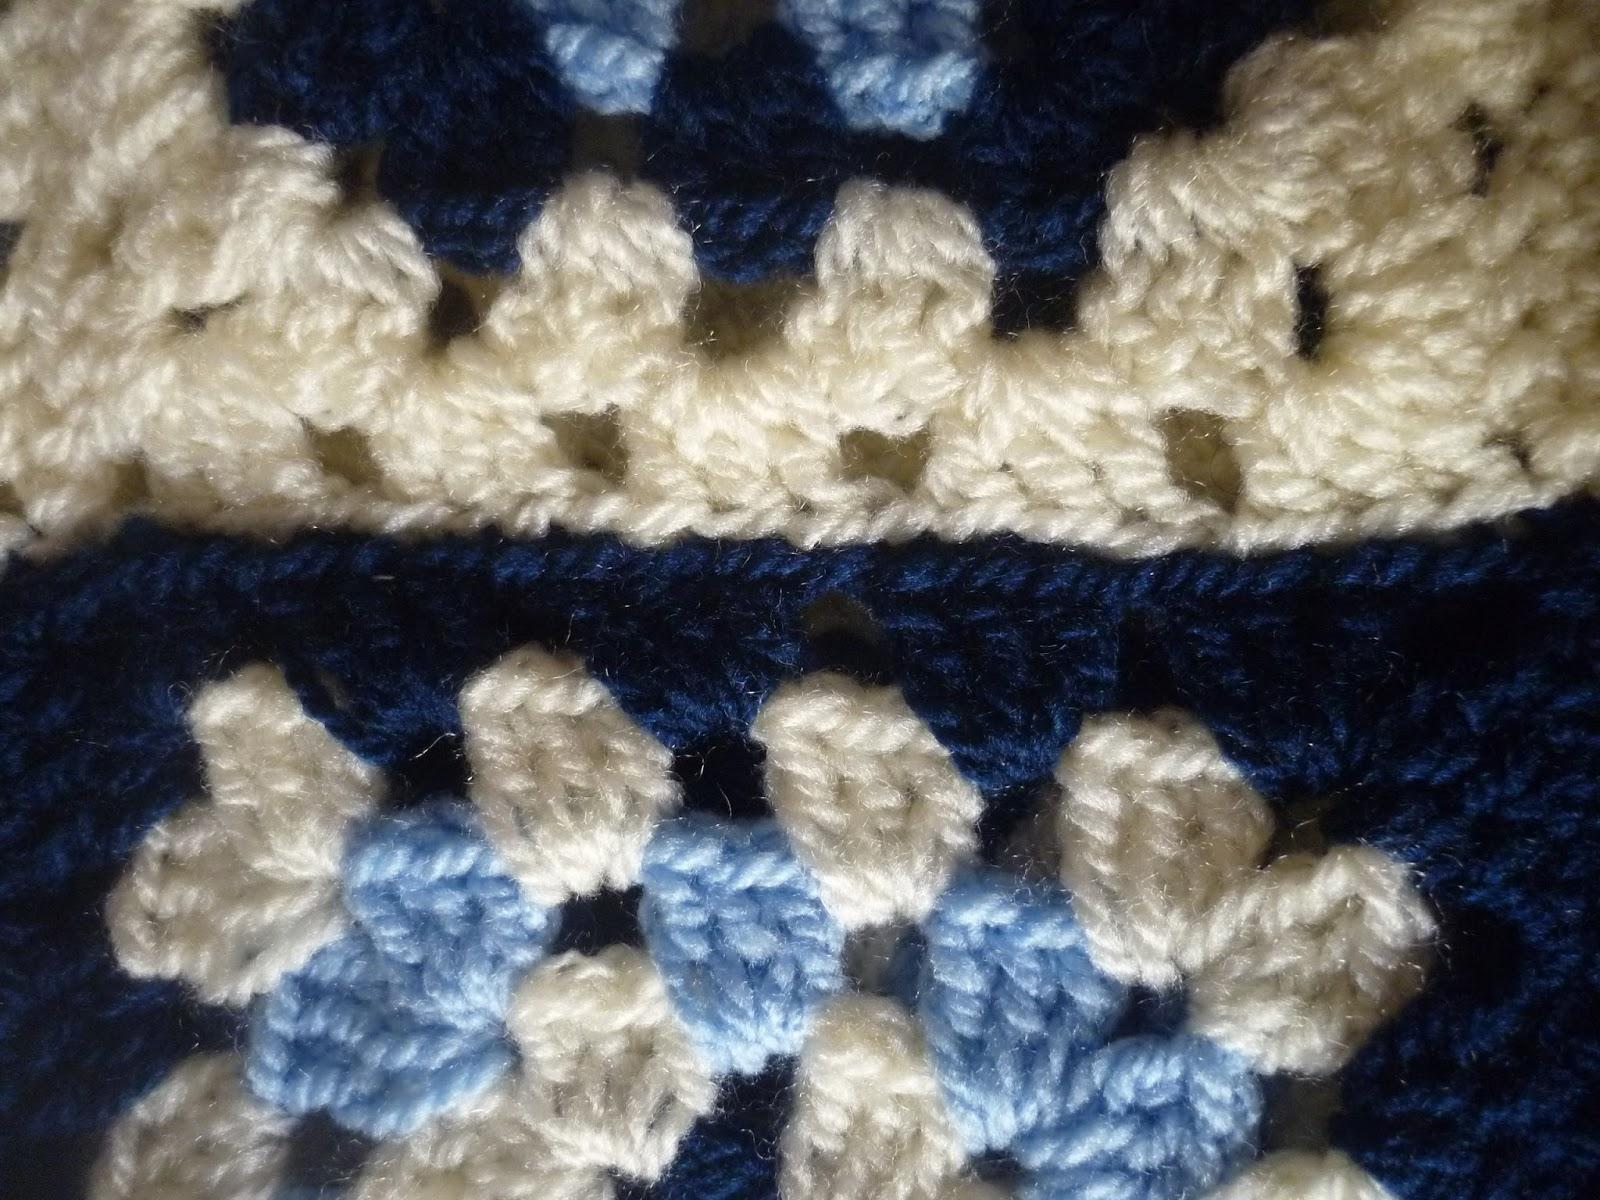 Blog de crochet de Crochetingbox.com: ¿Cómo tejer una manta Granny?